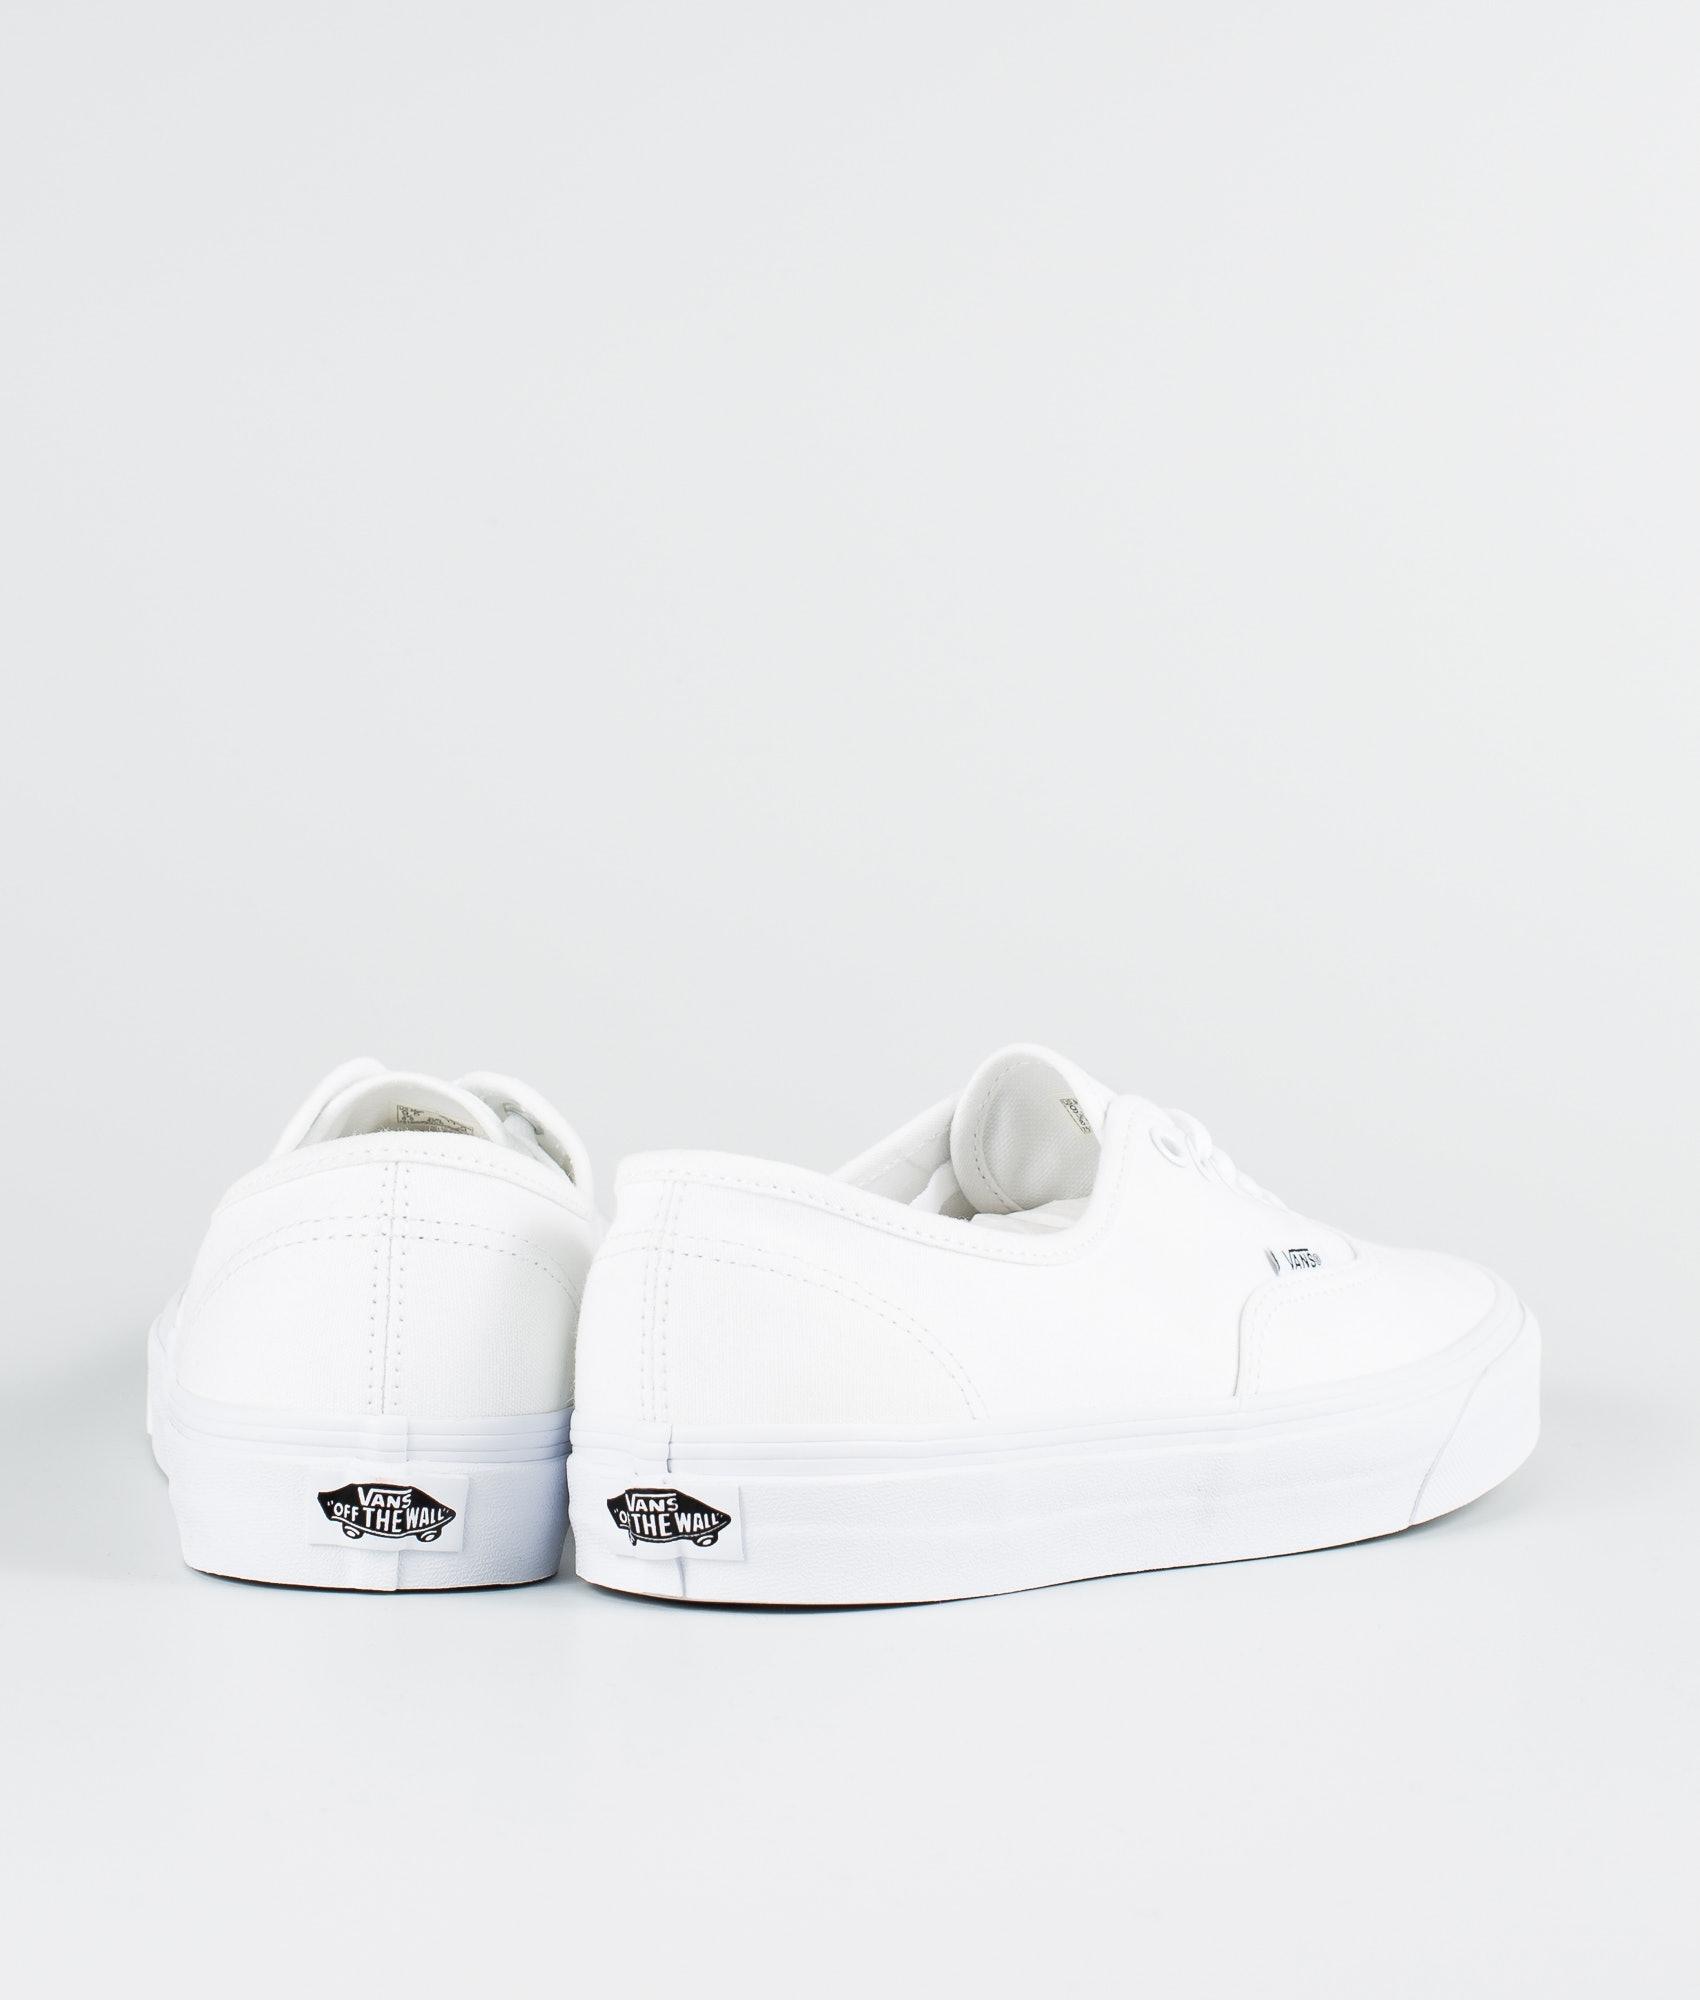 ca9081ba838 Vans Authentic Shoes True White - Ridestore.com